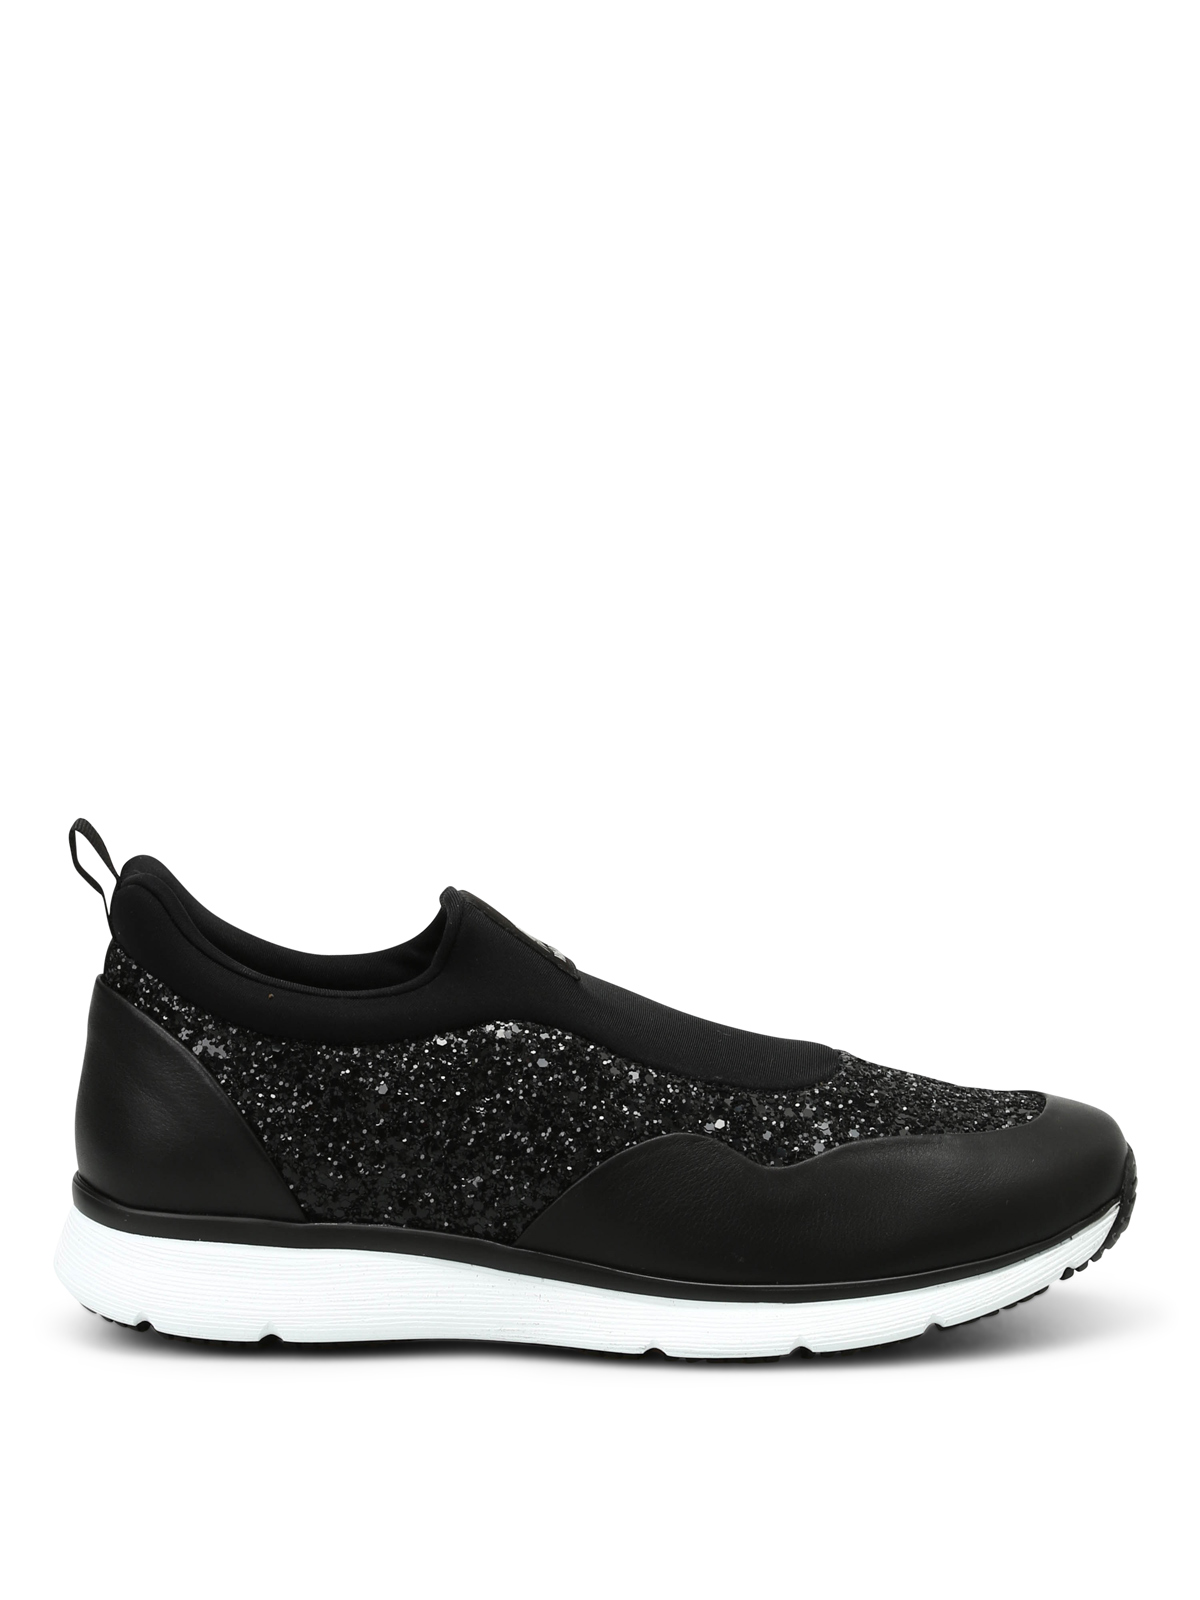 Sneakers Hogan - H254 Traditional 2015 Pantofola - HXW2540W480ESEB999